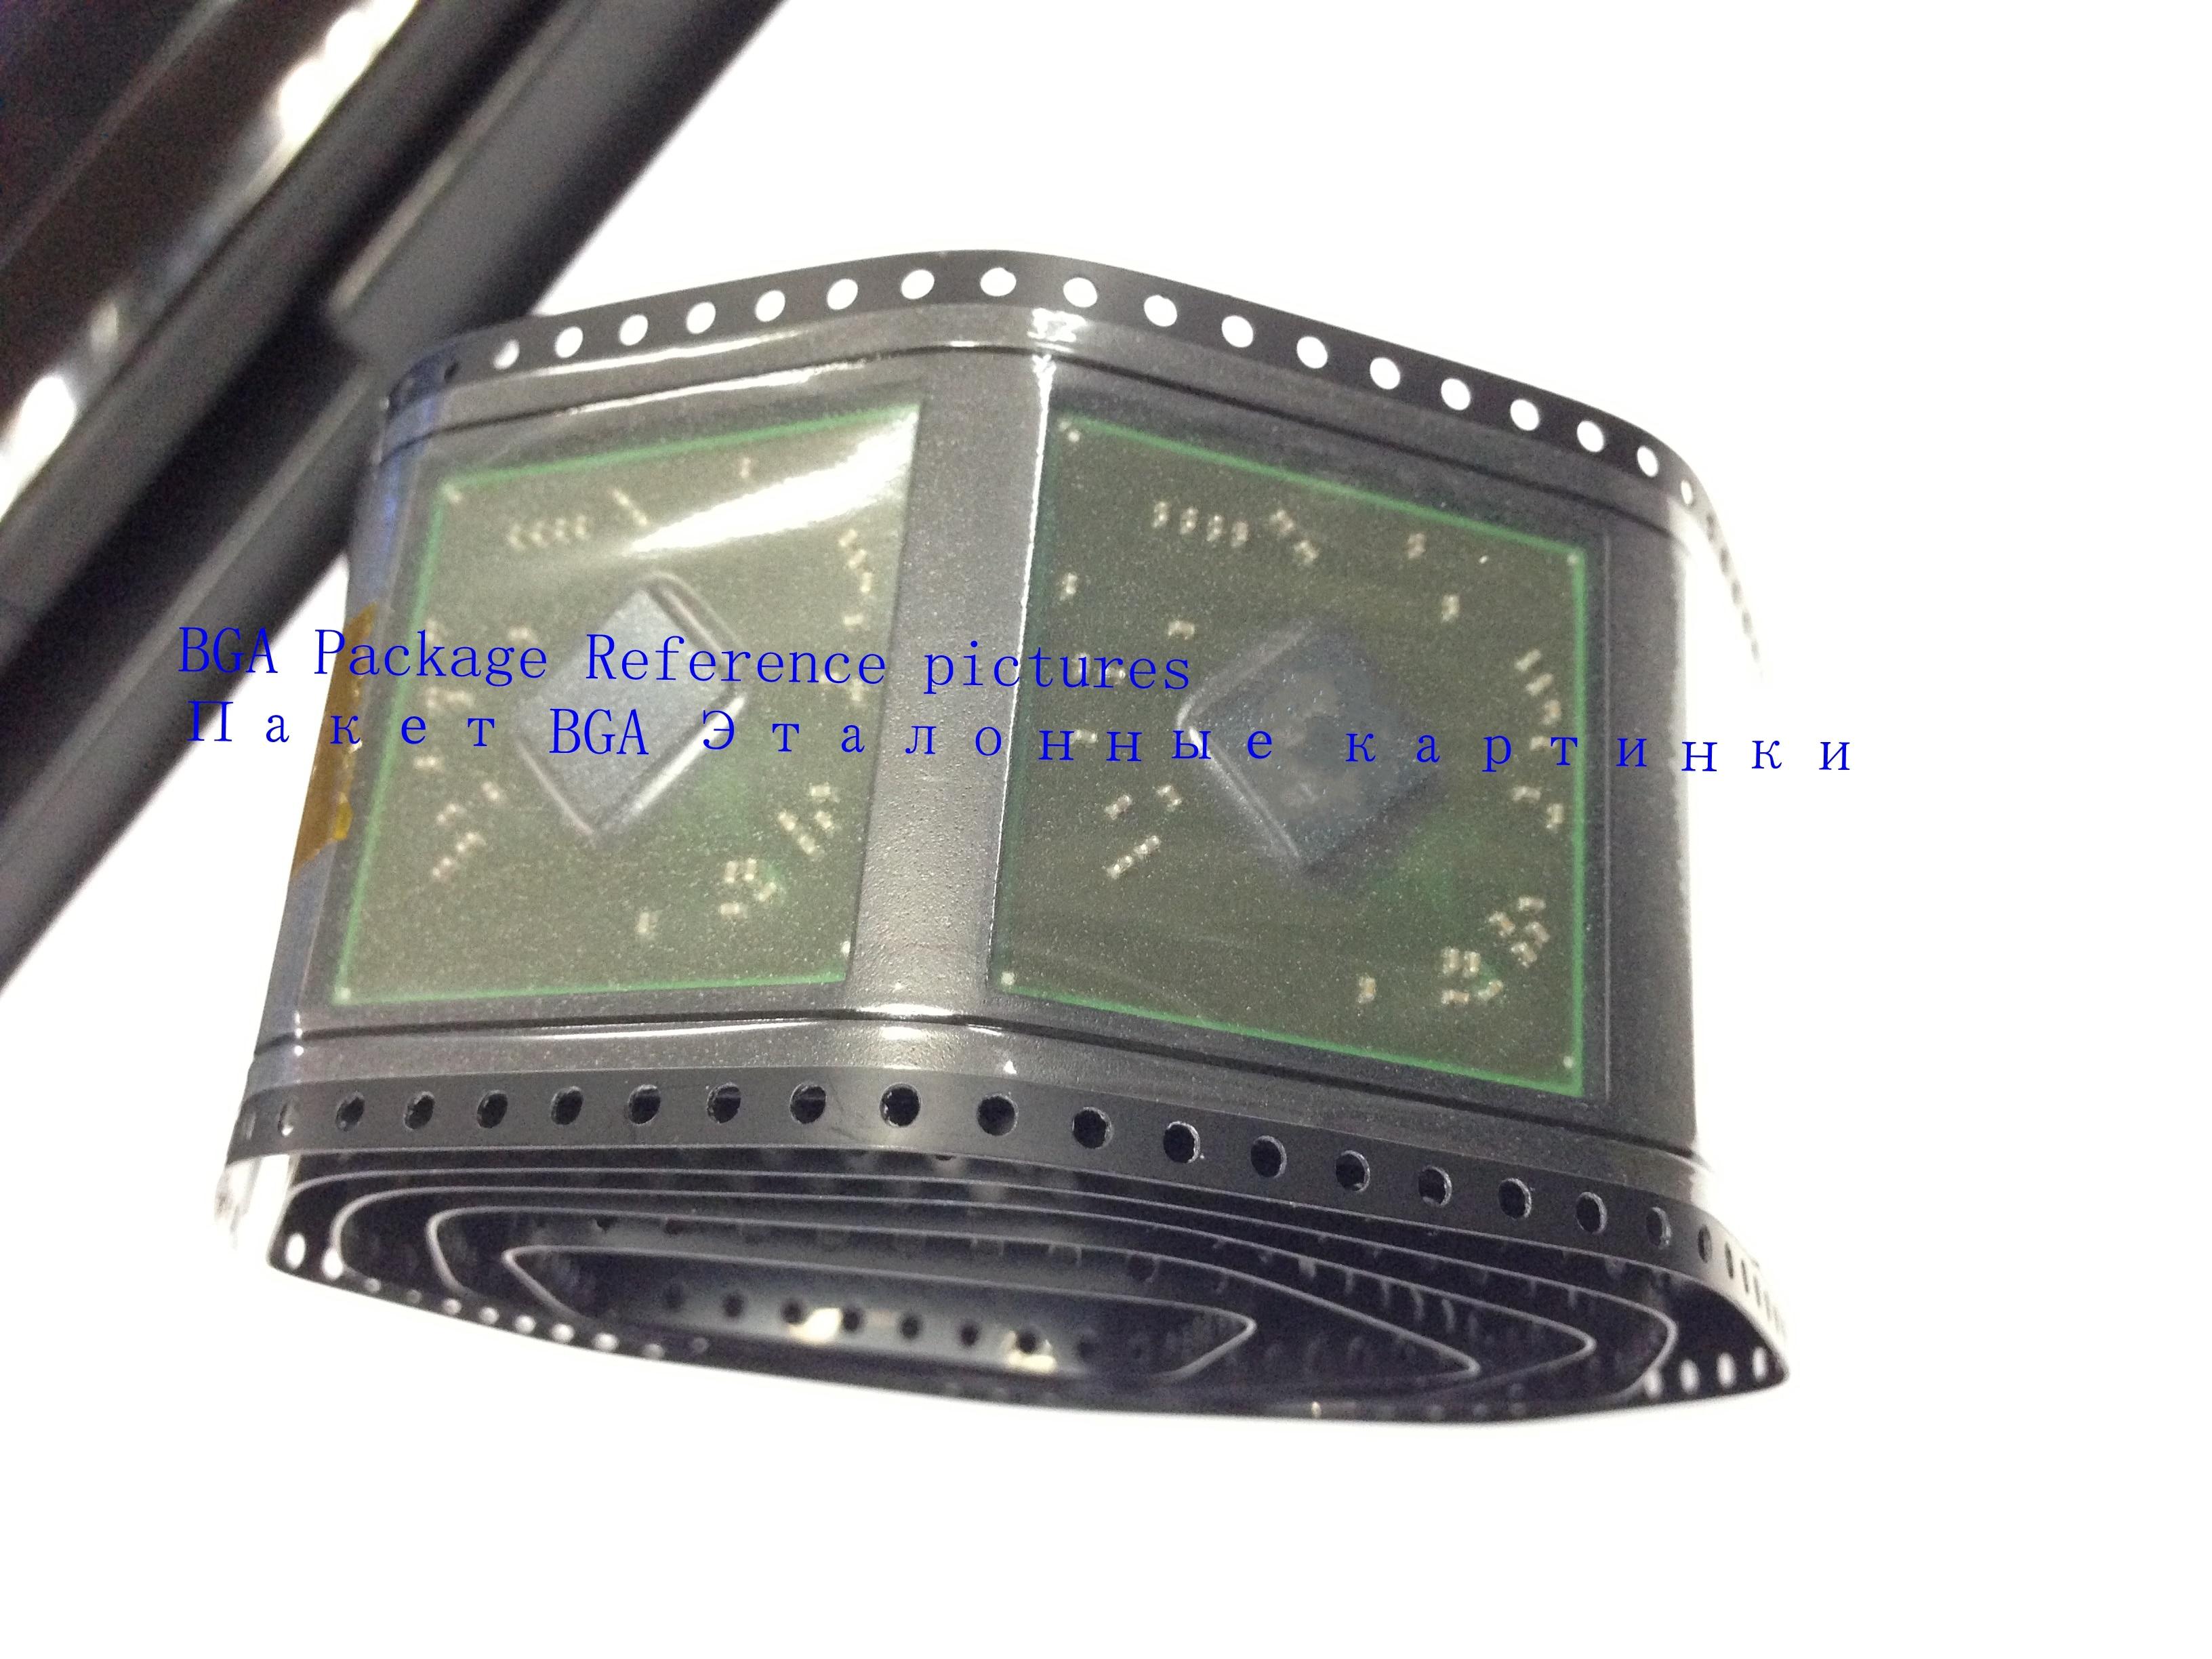 1pcs/lot 100% New 216-0707001 216 0707001 BGA Chipset1pcs/lot 100% New 216-0707001 216 0707001 BGA Chipset